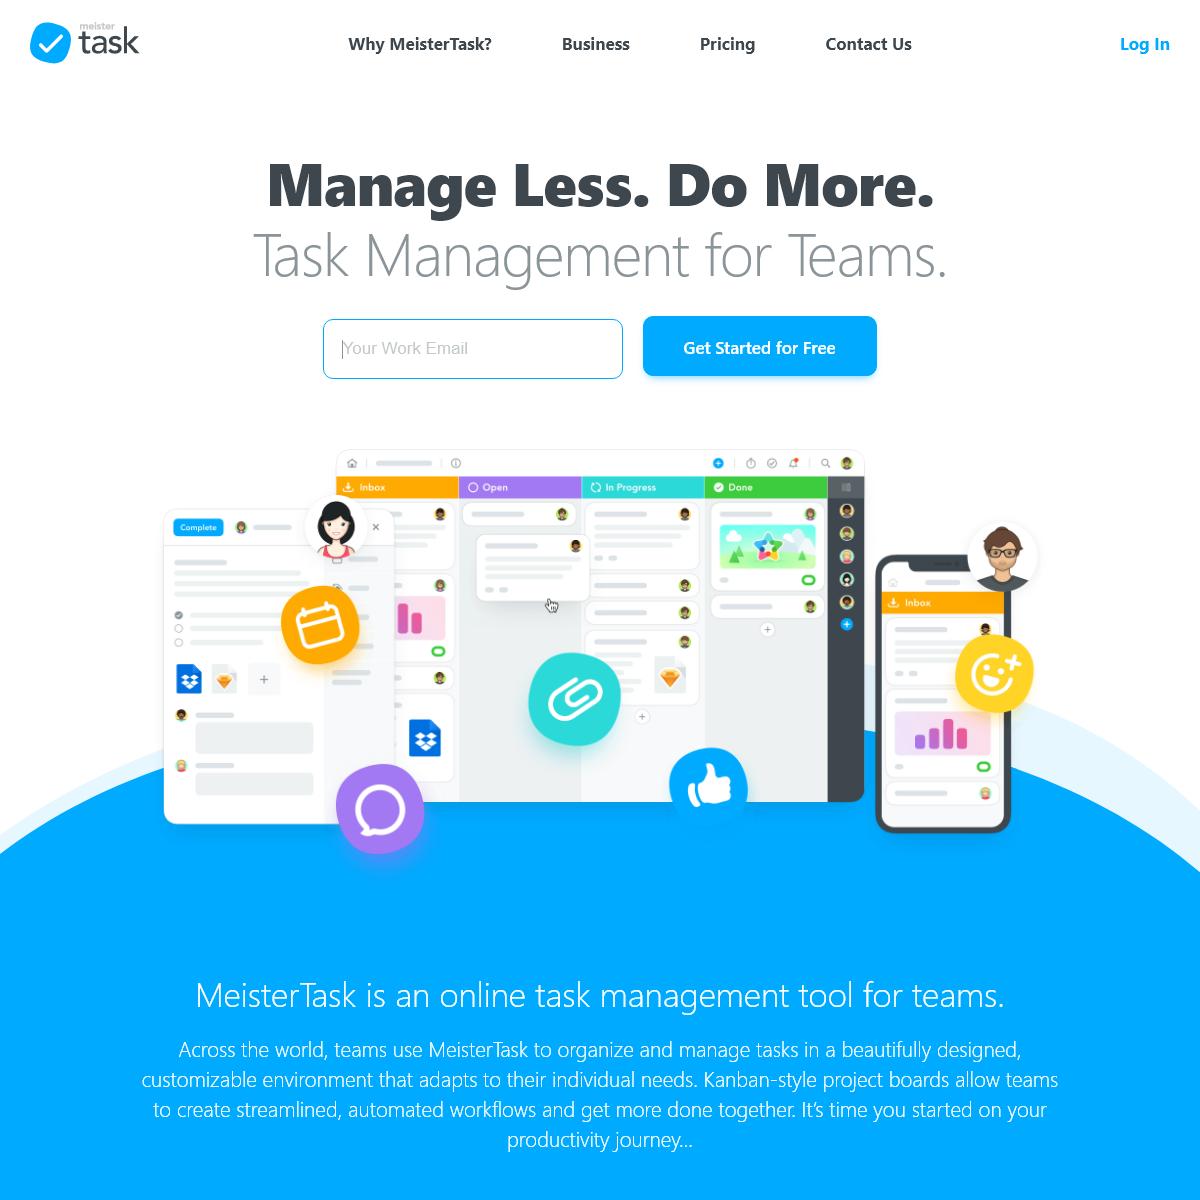 Task Management for Teams - MeisterTask